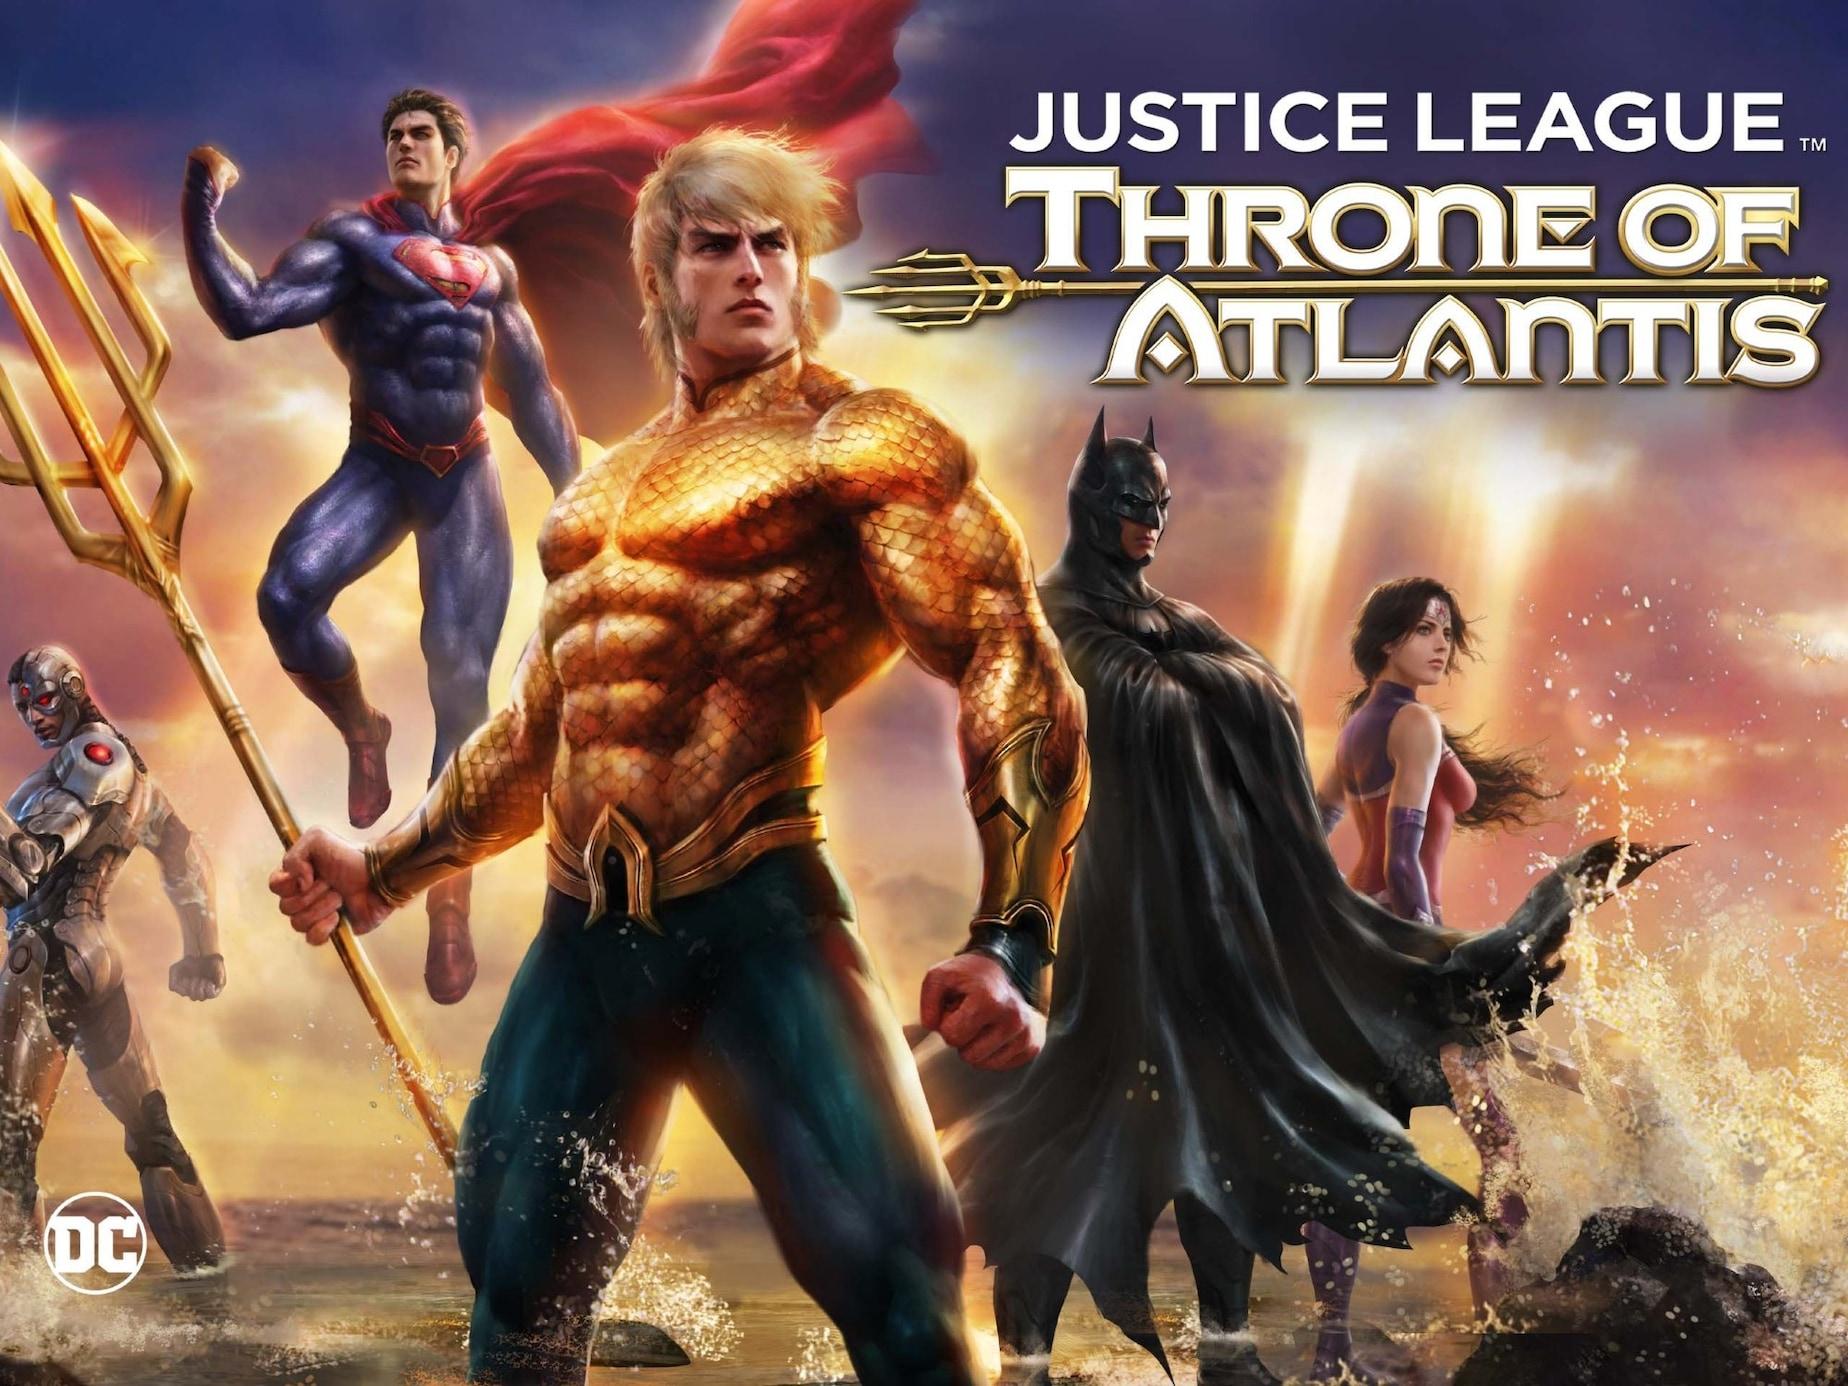 Justice League: Throne of Atlantis Full Movie - Watch Online, Stream